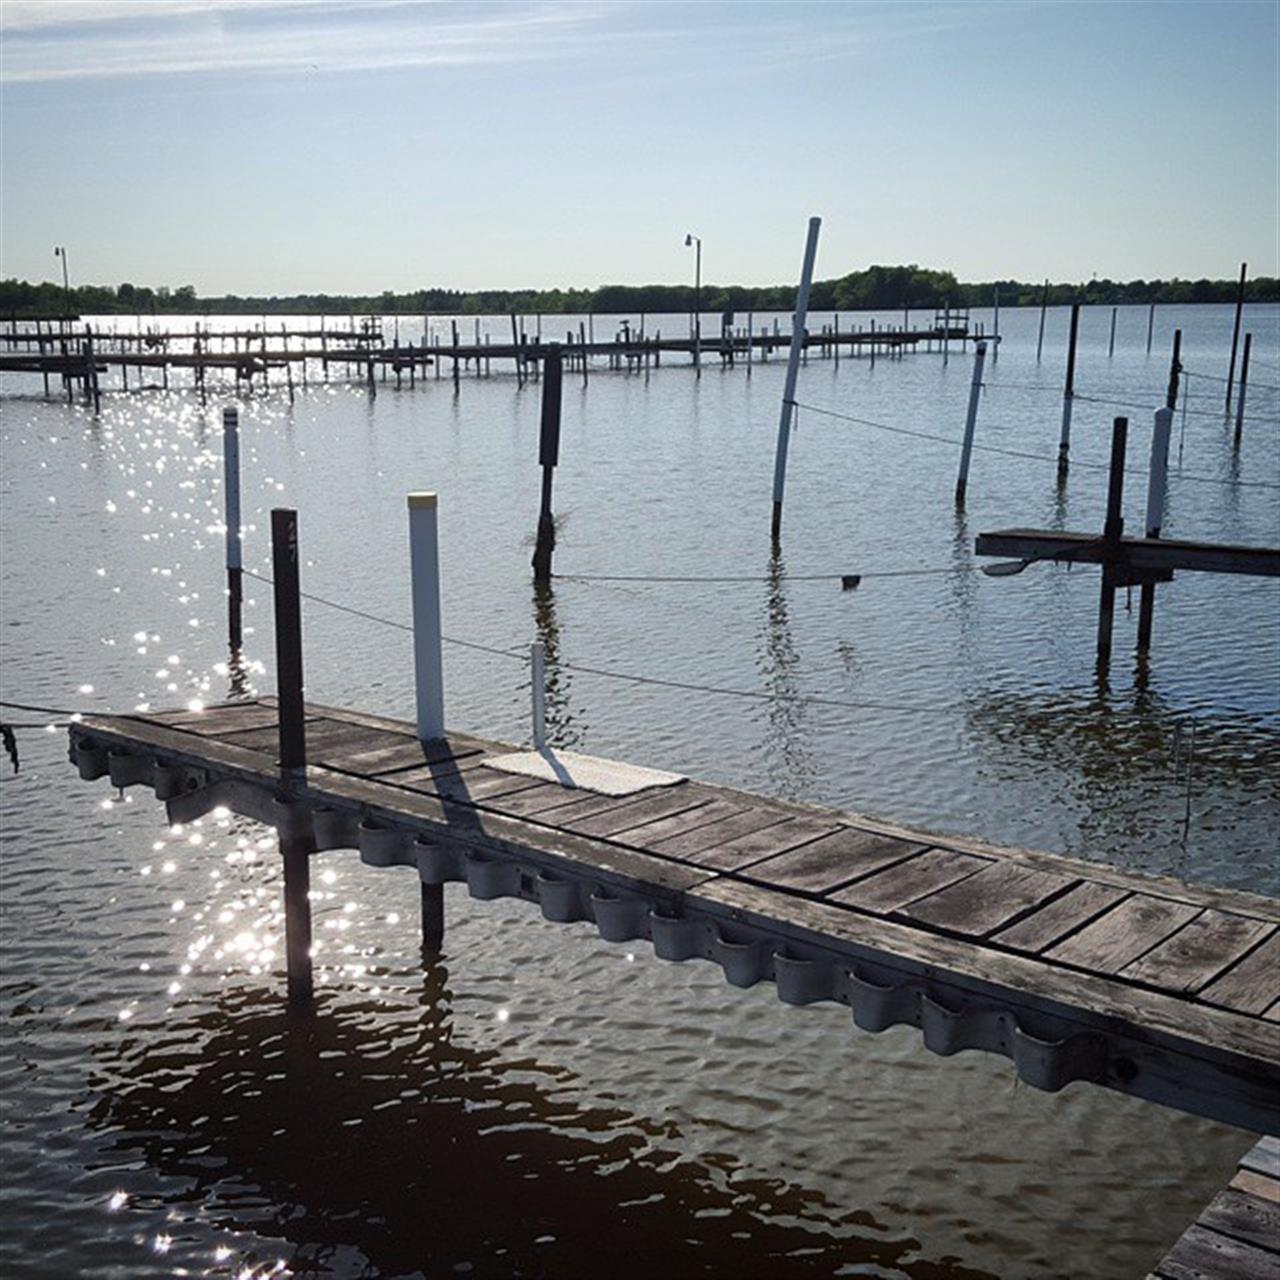 Walking on the docks at Braddock Bay in Rochester NY #dock #lake #water #blueskies #rochesterny #roctopshots #leadingrelocal #marina